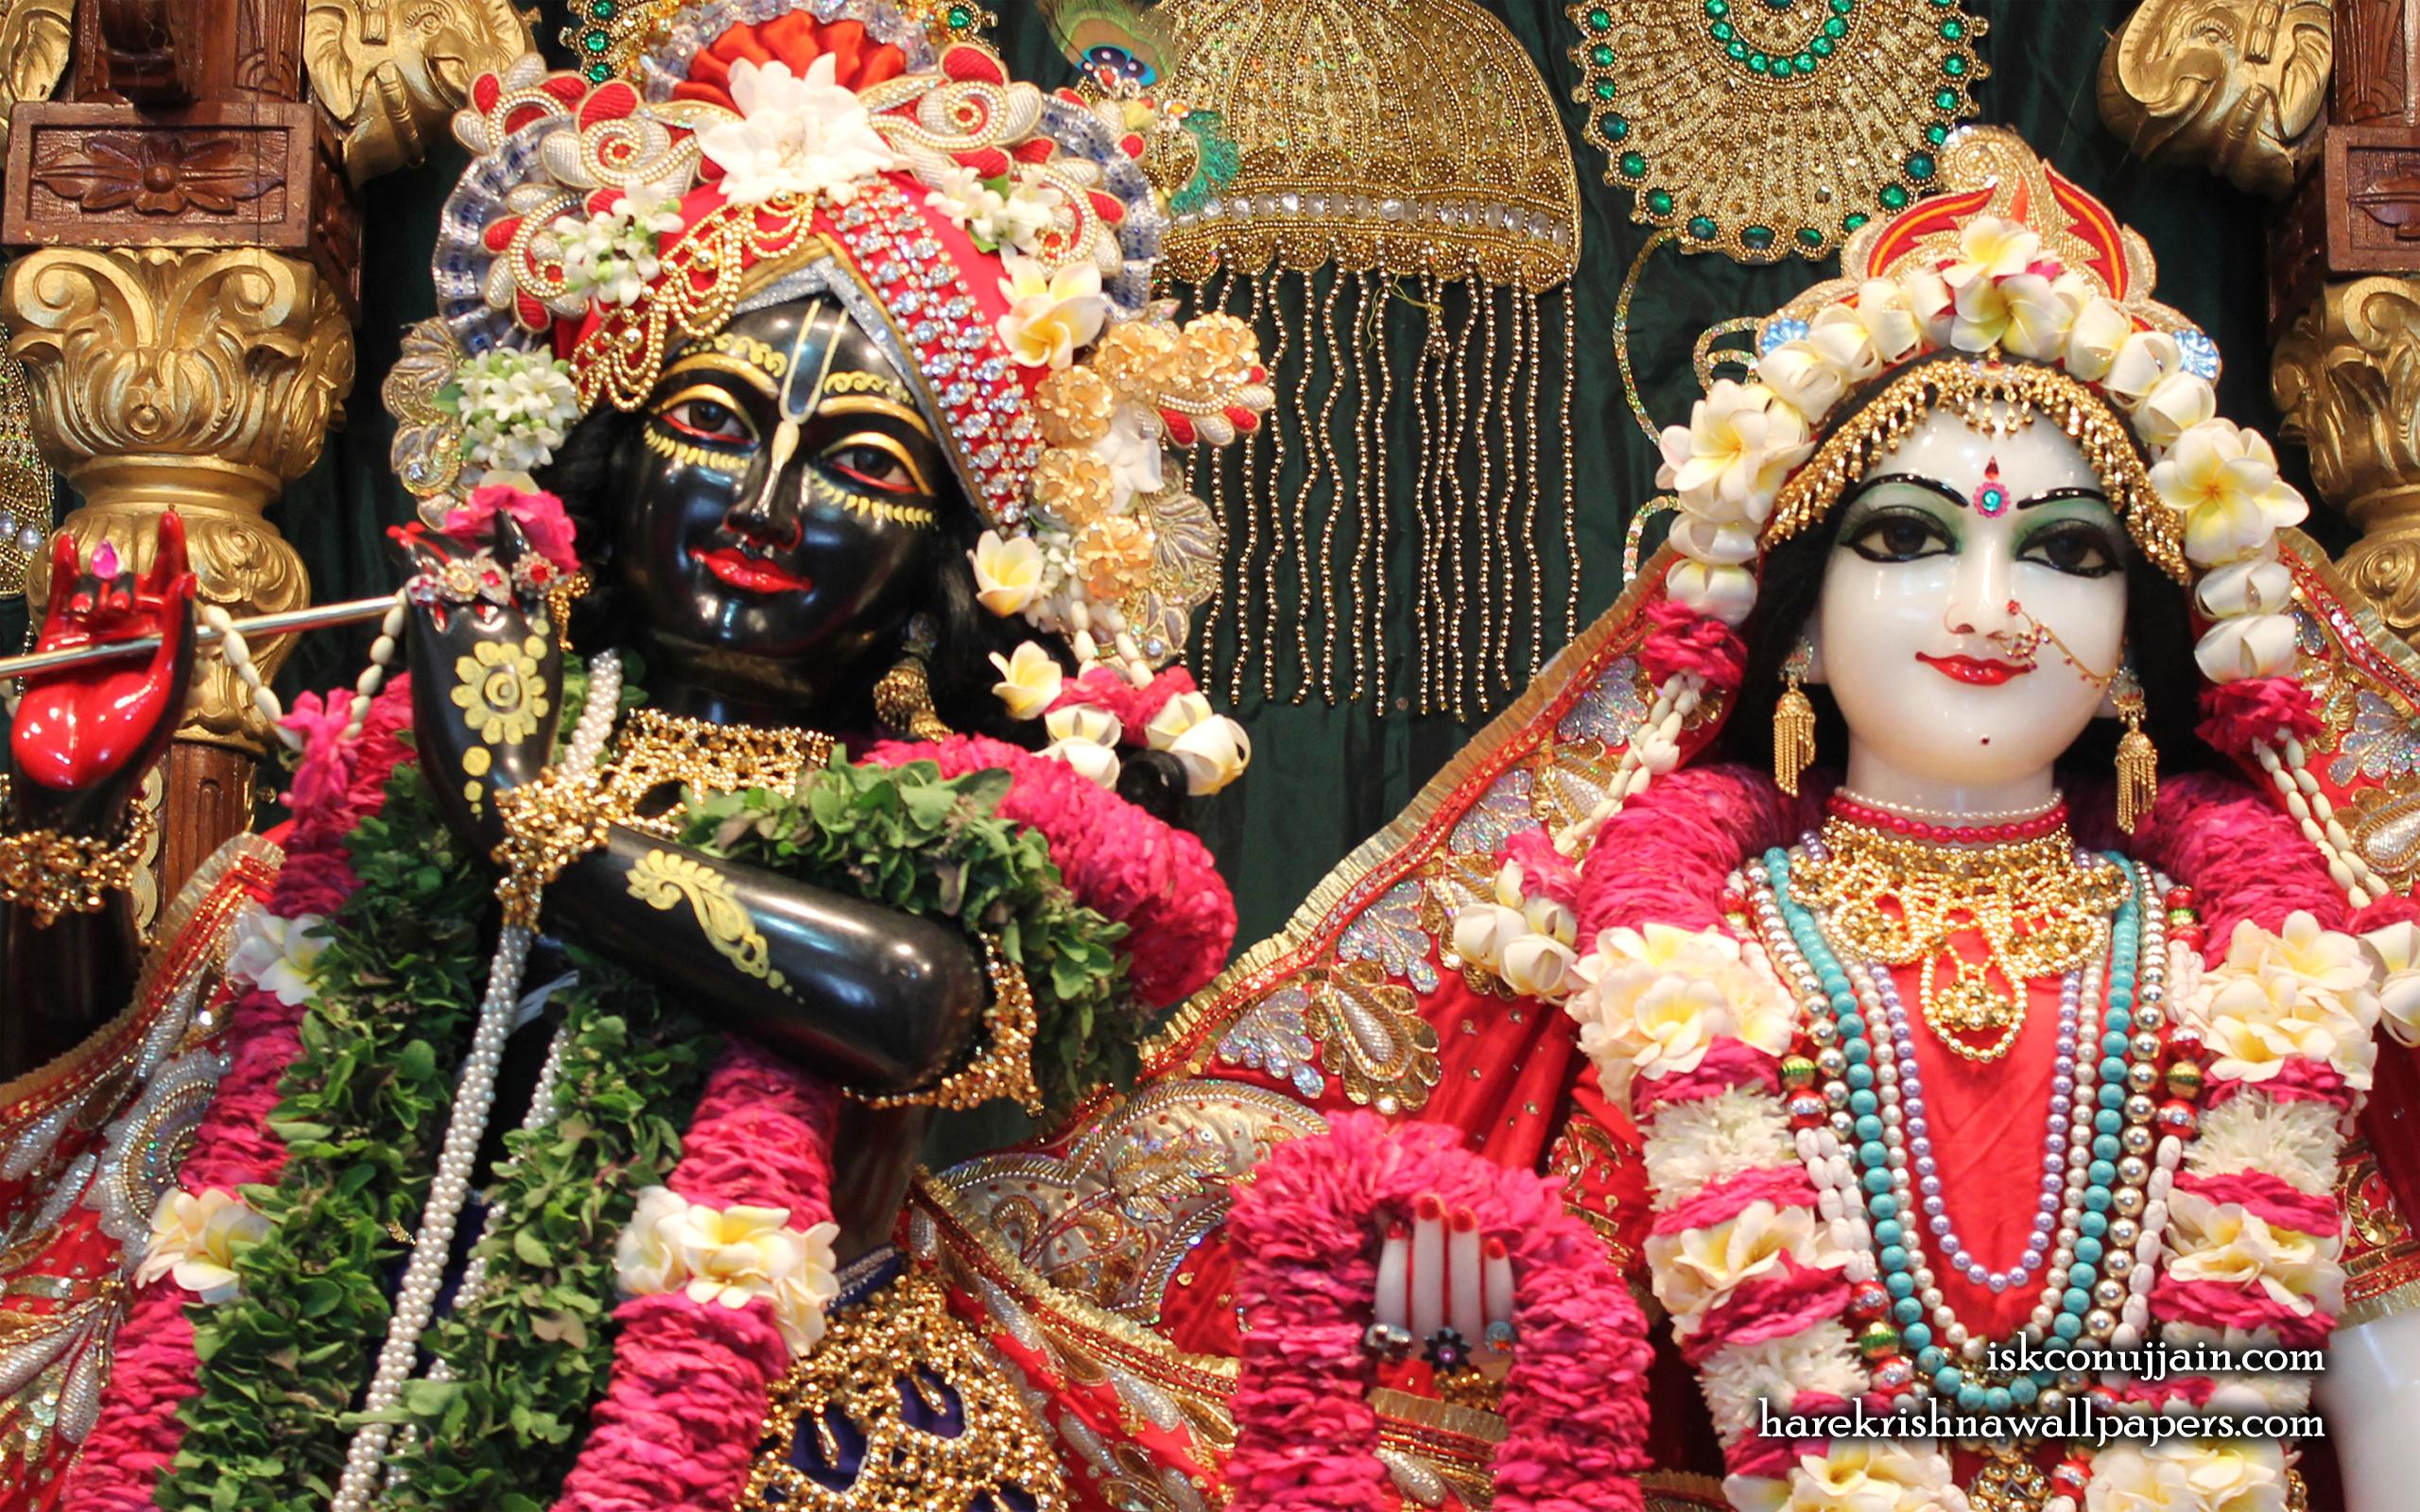 Sri Sri Radha Madanmohan Close up Wallpaper (002) Size 2560x1600 Download